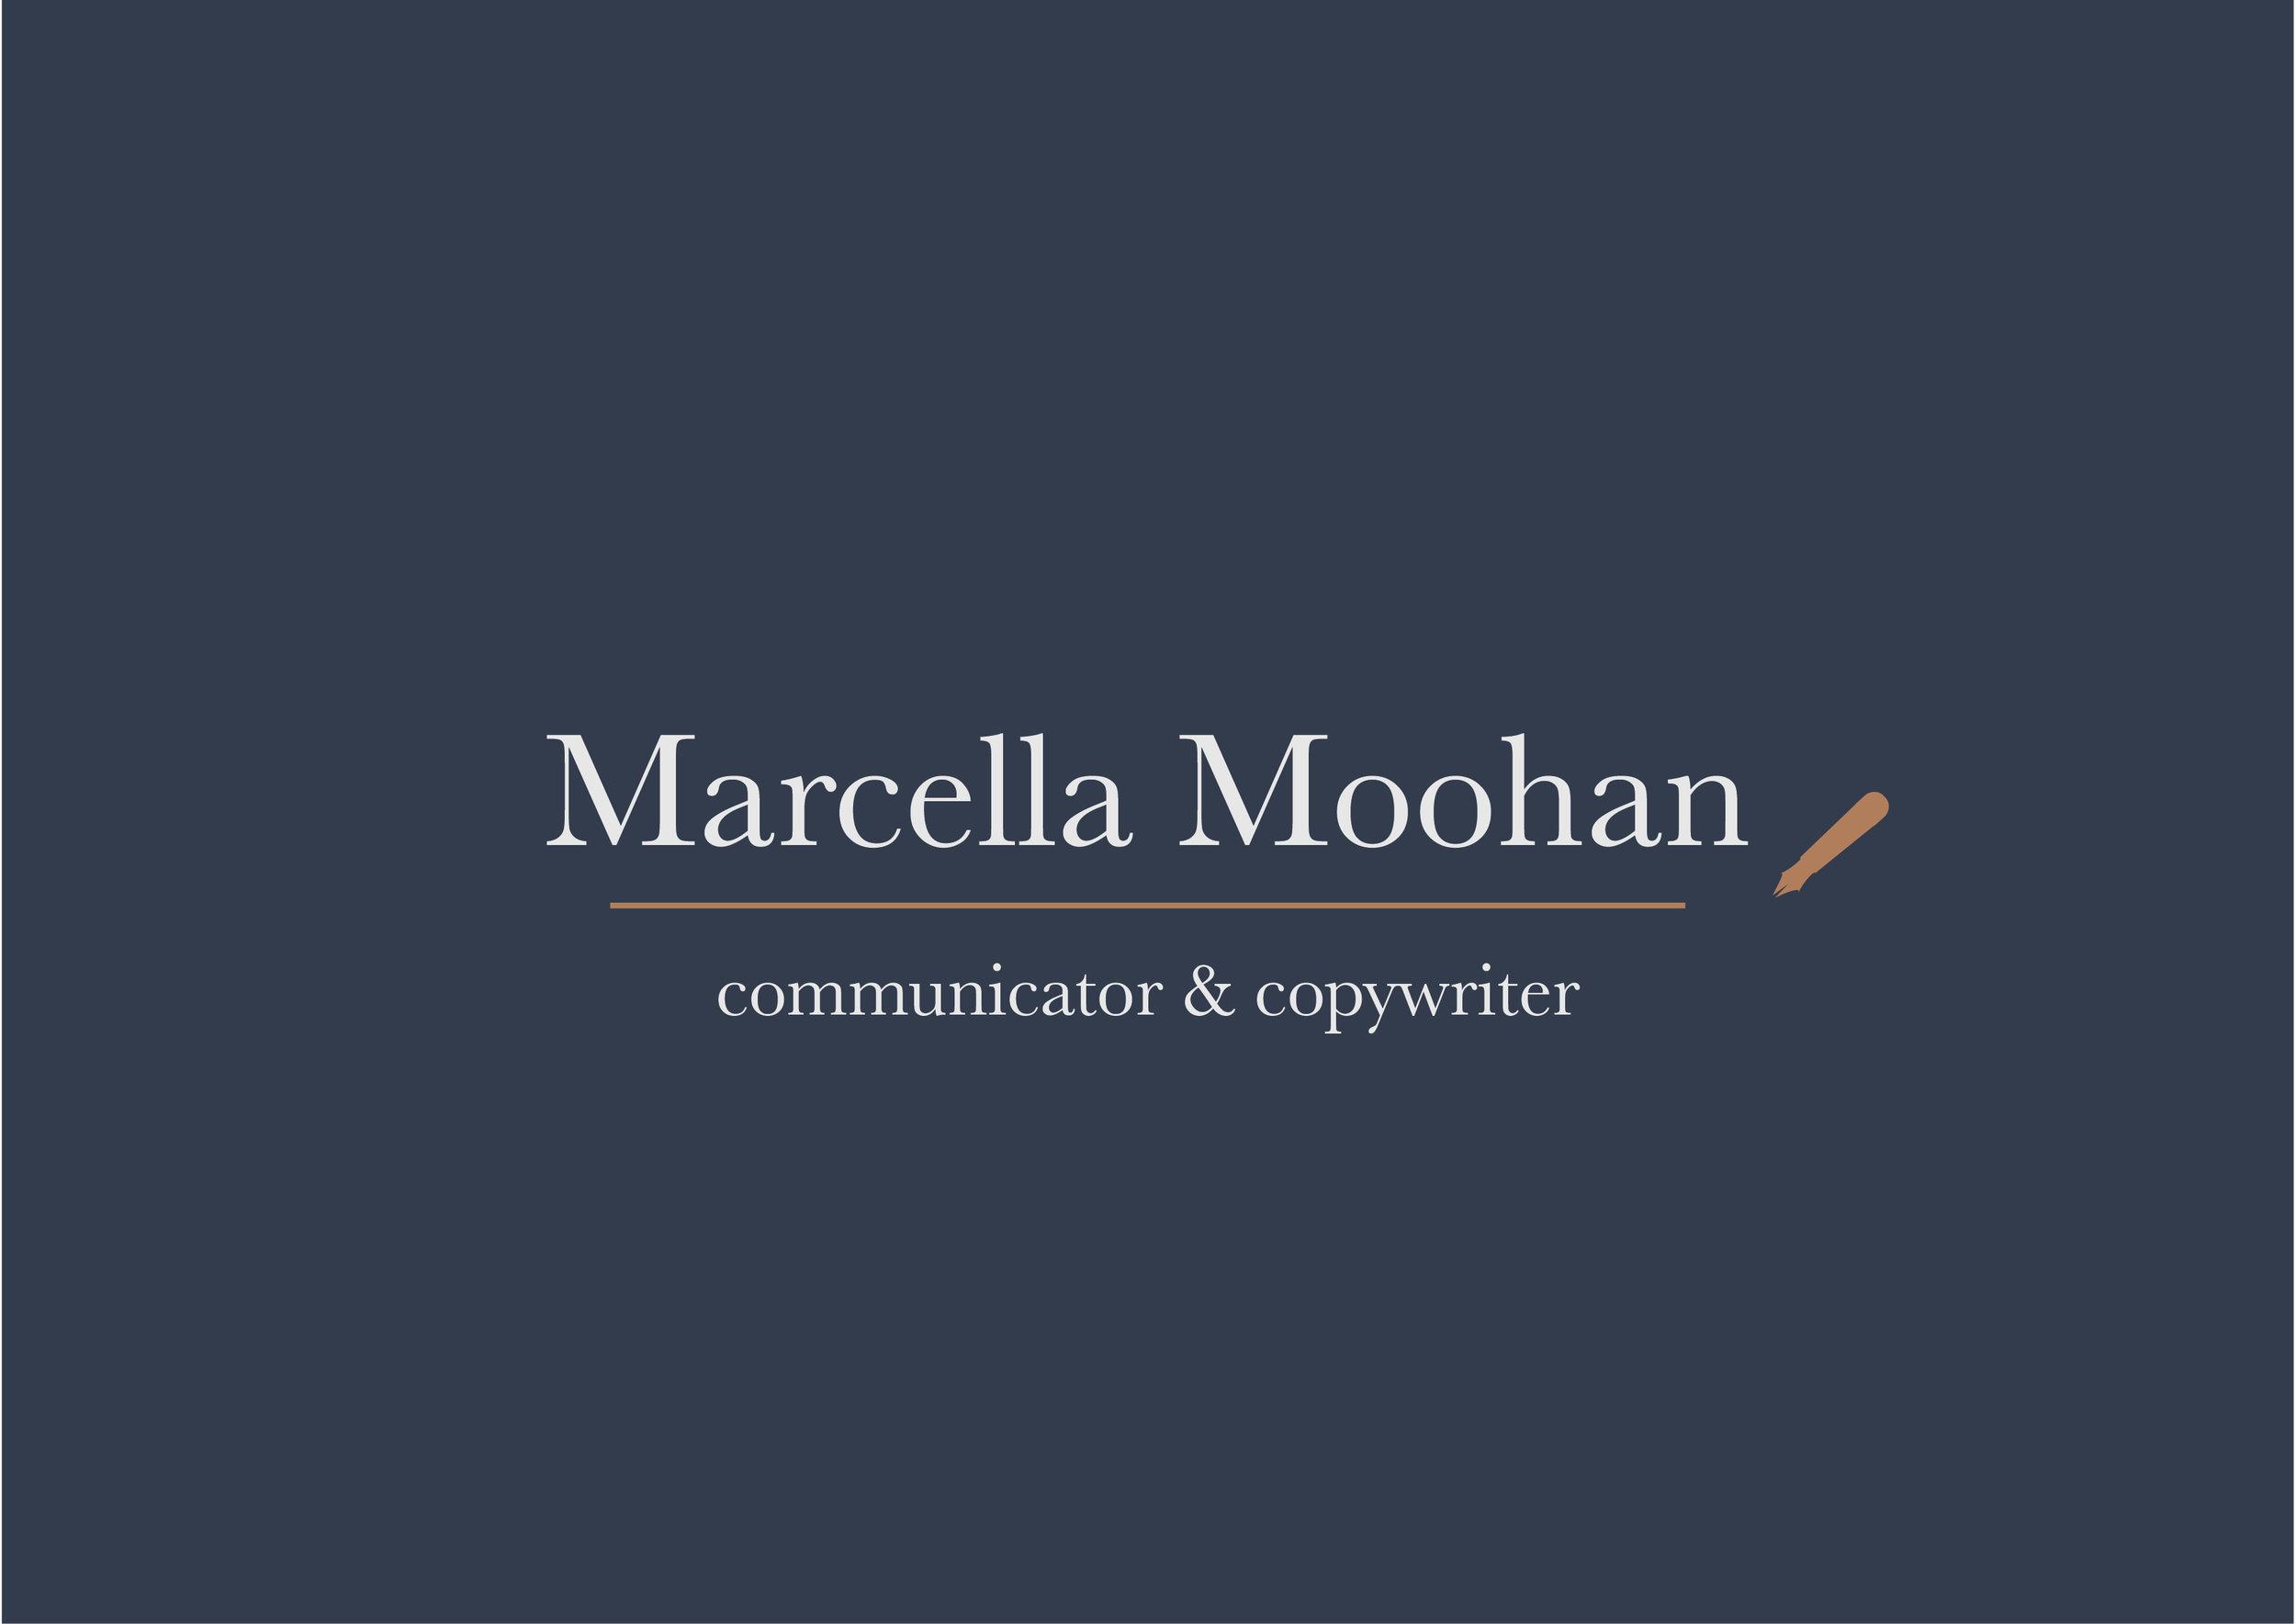 Marcella Moohan Branding Process | MNFL Design